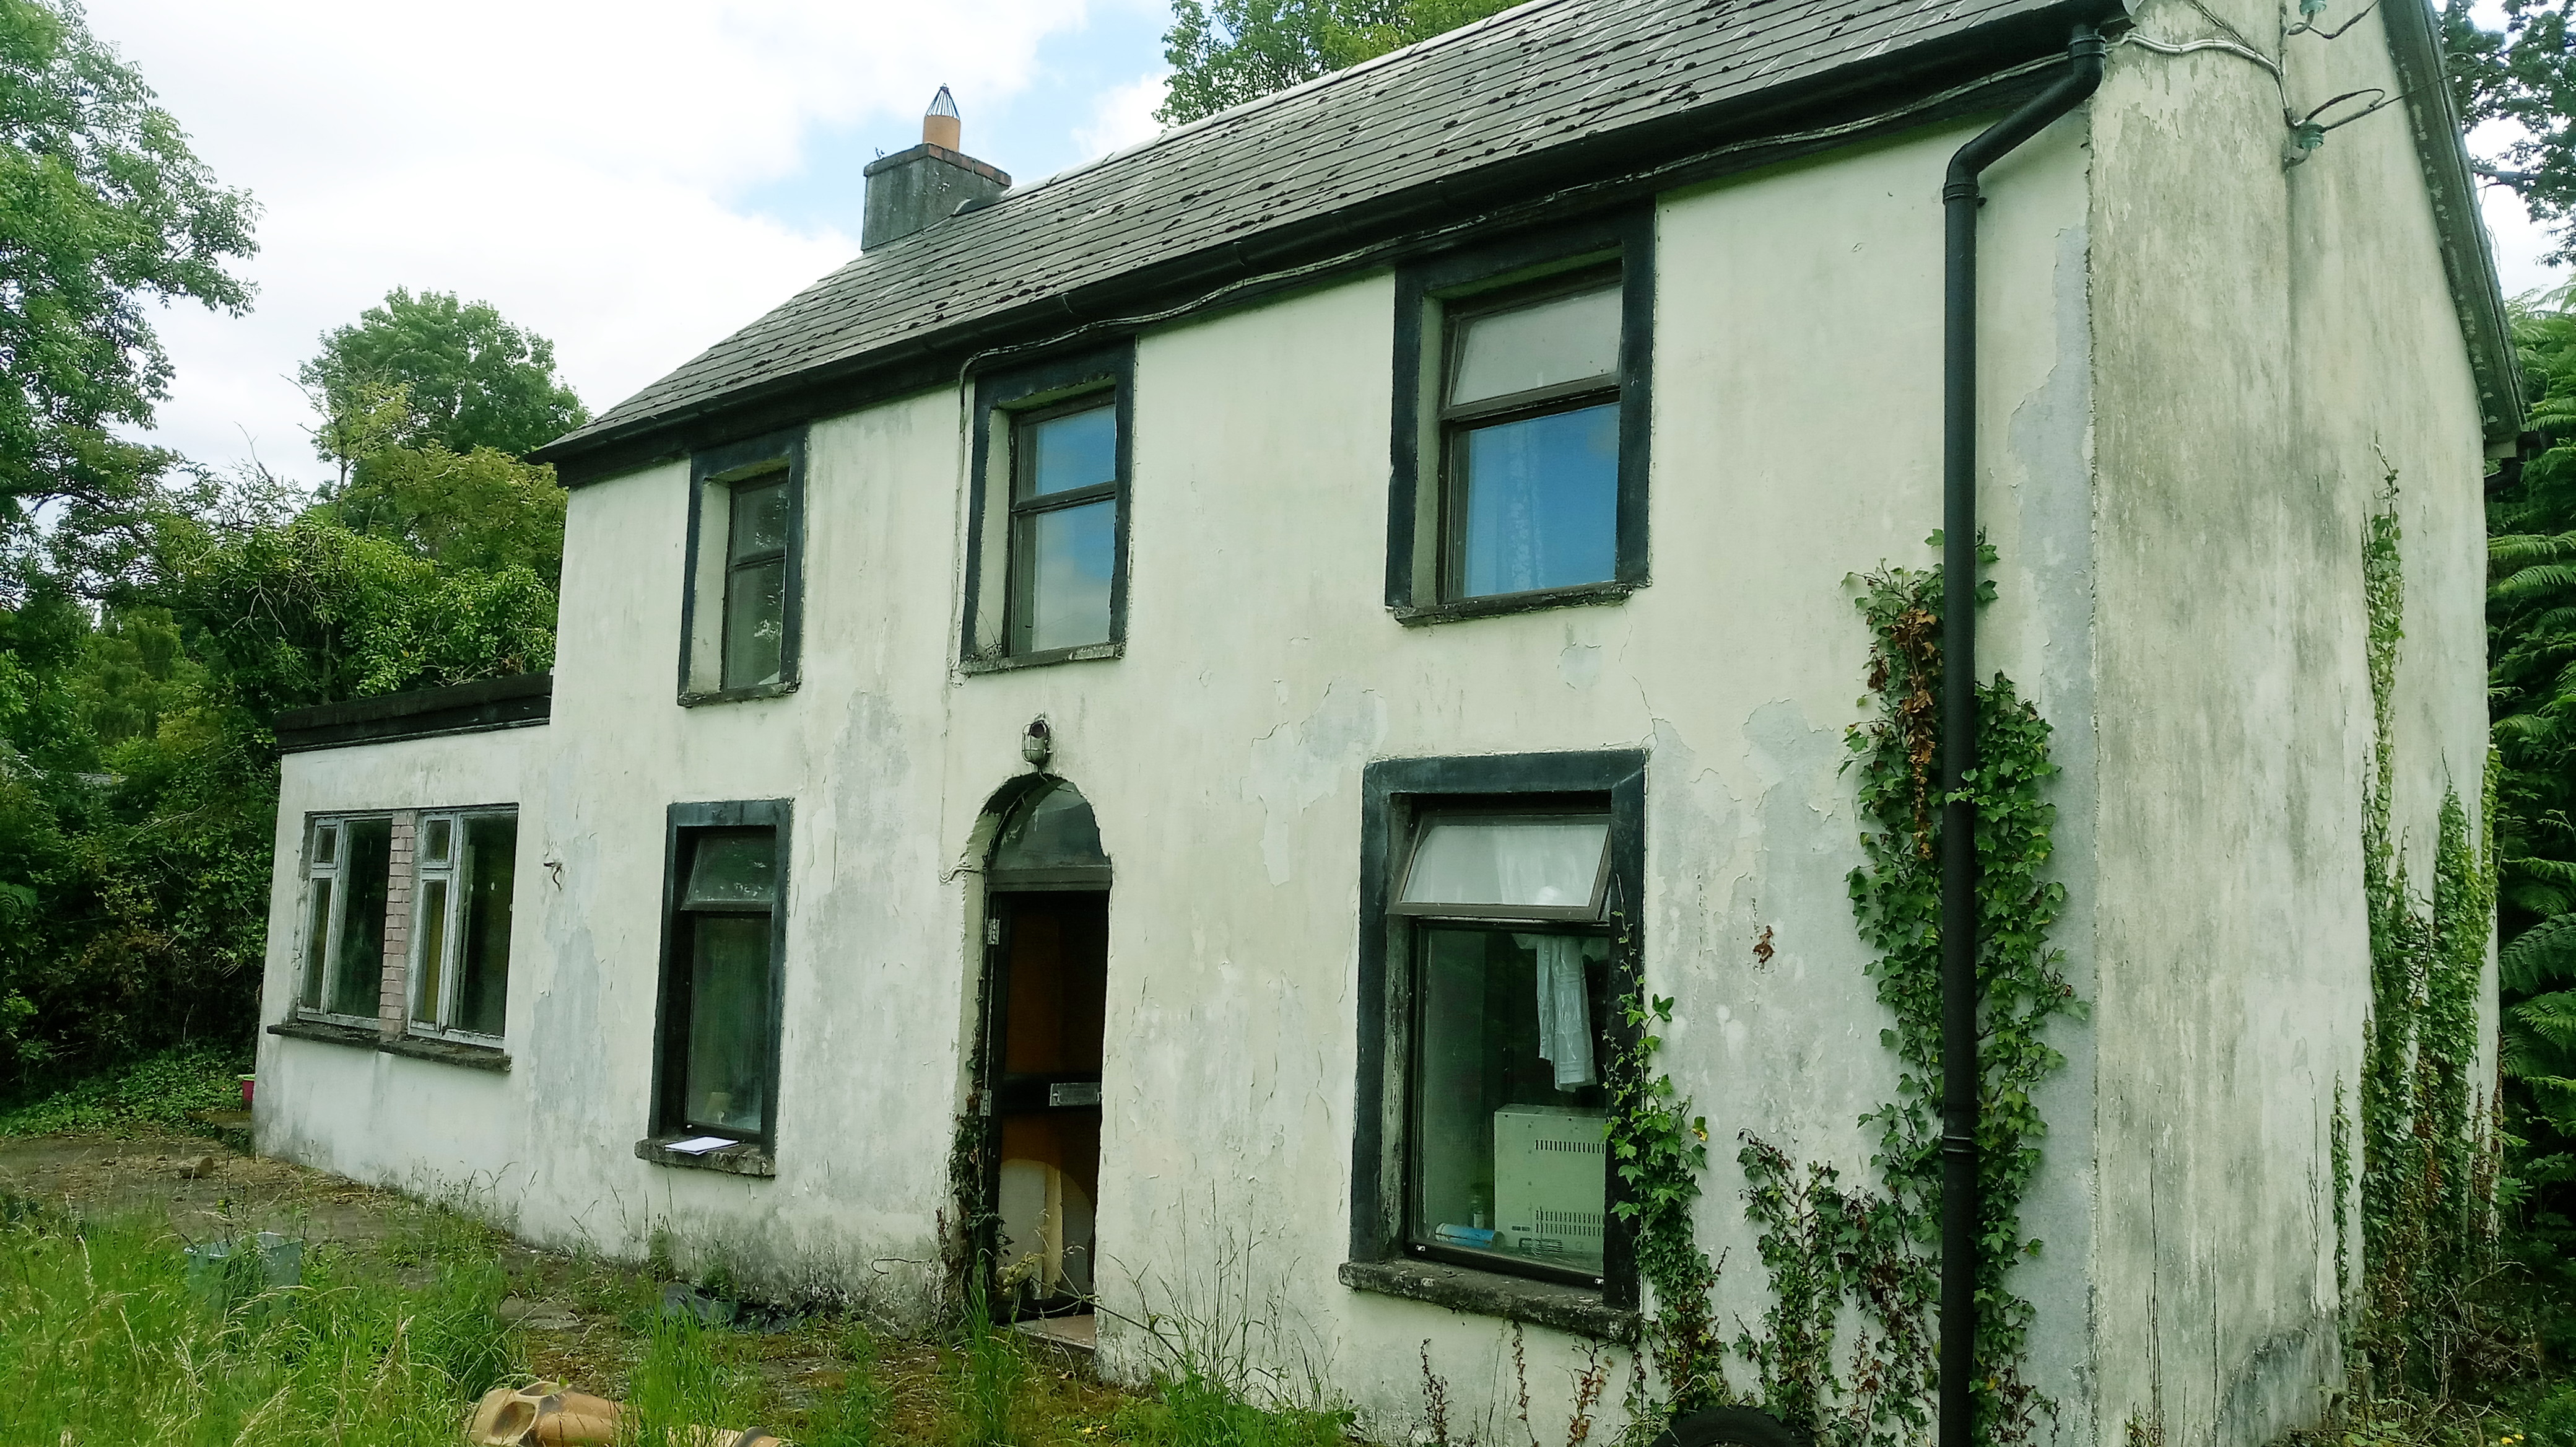 Exterior of O'Callaghan House